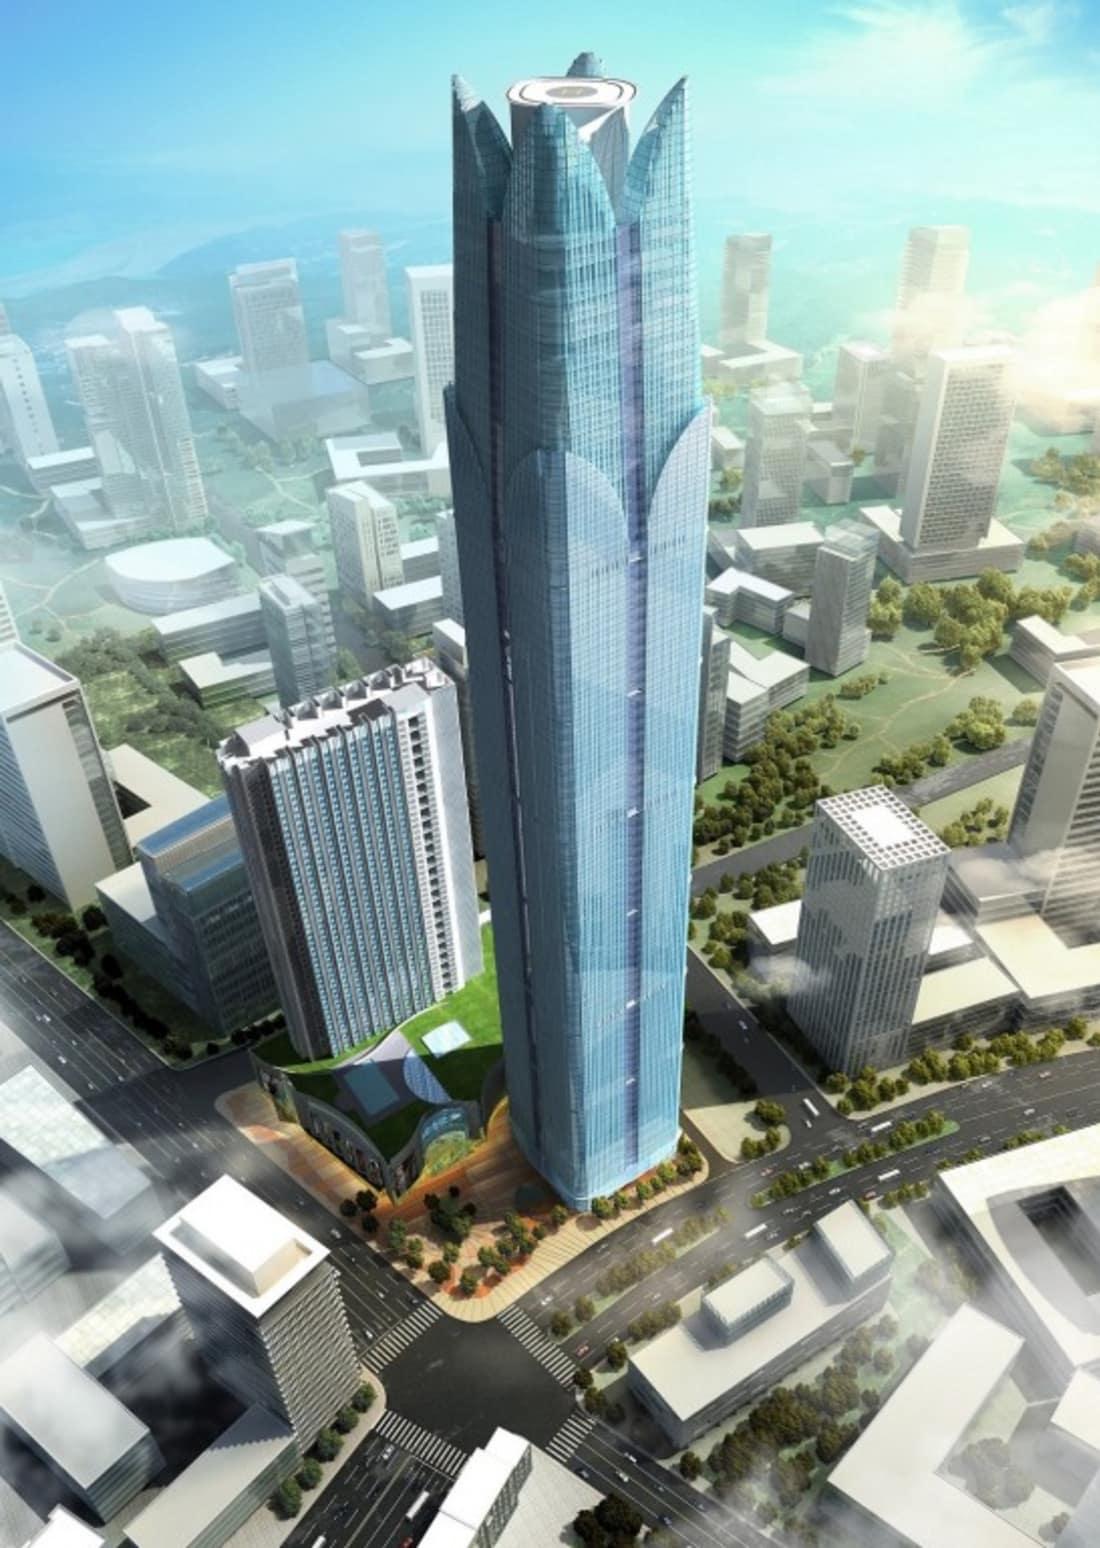 Dubai and Saudi Arabia towers in time war to be world's